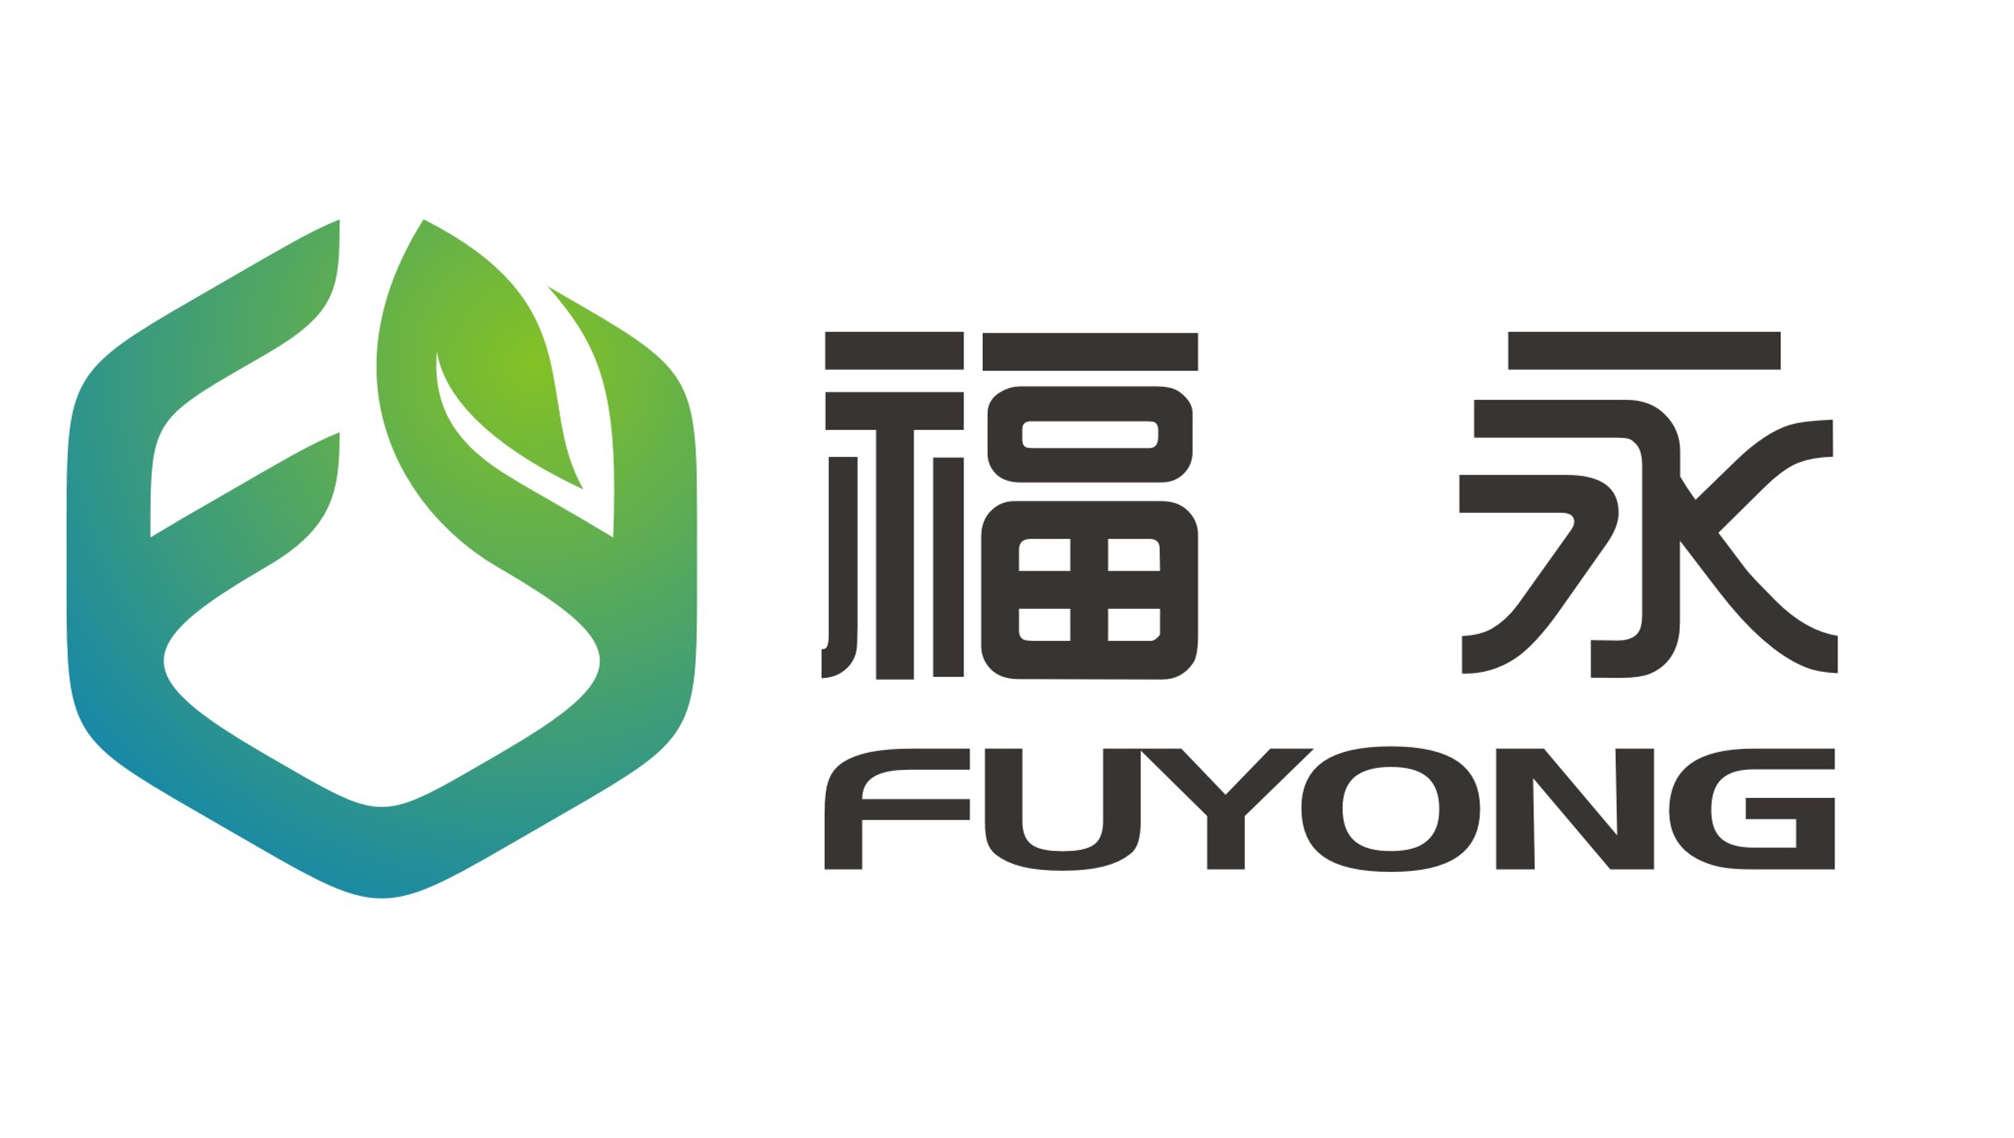 Inner Mongolia Fuyong Agriculture Development logo